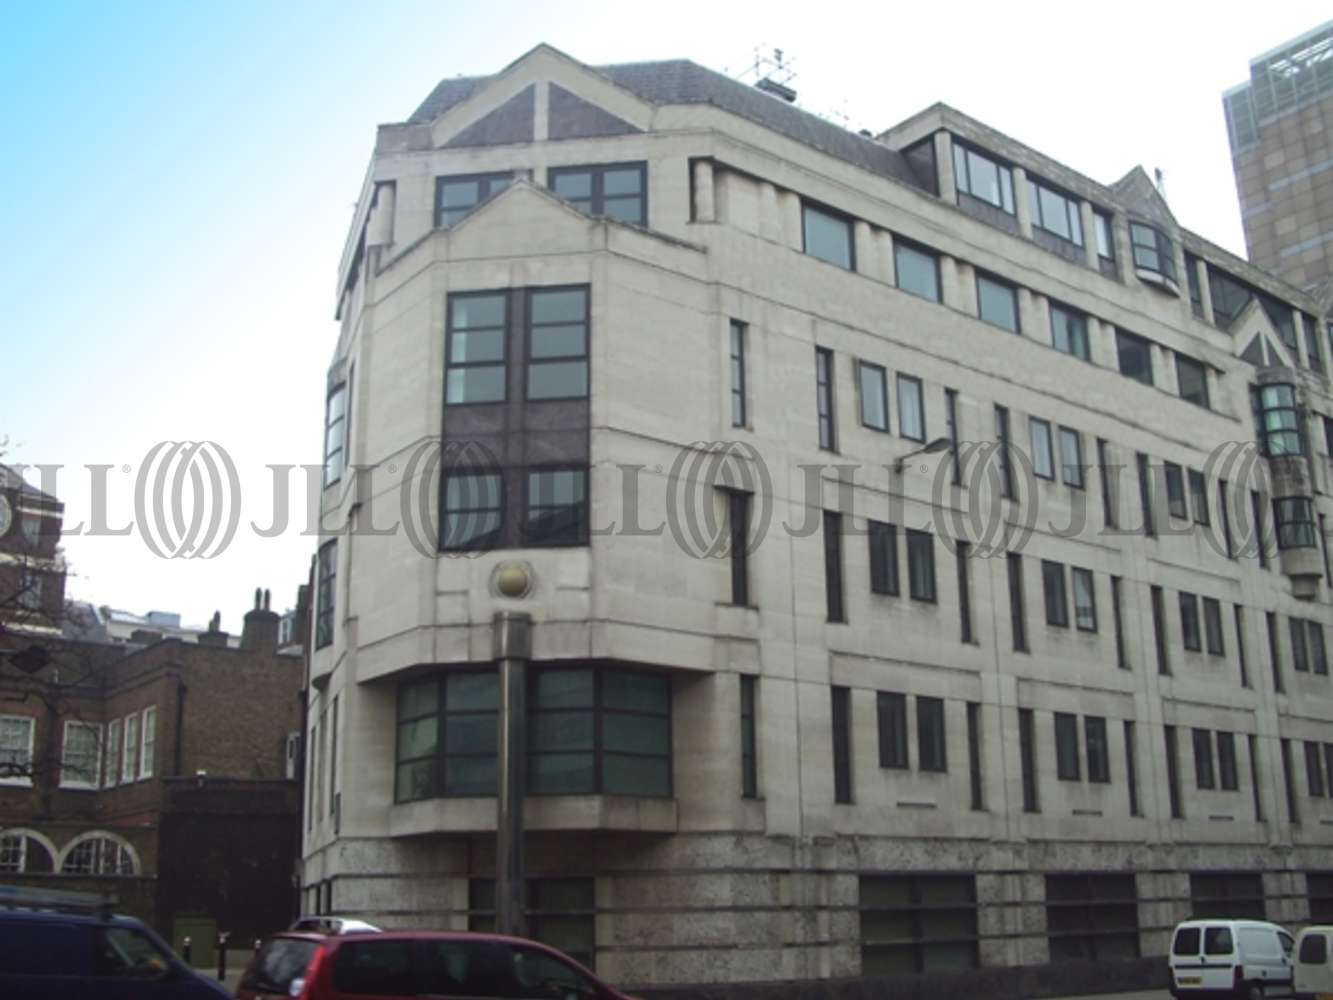 Serviced office London, EC4R 2SU - Dowgate Hill House